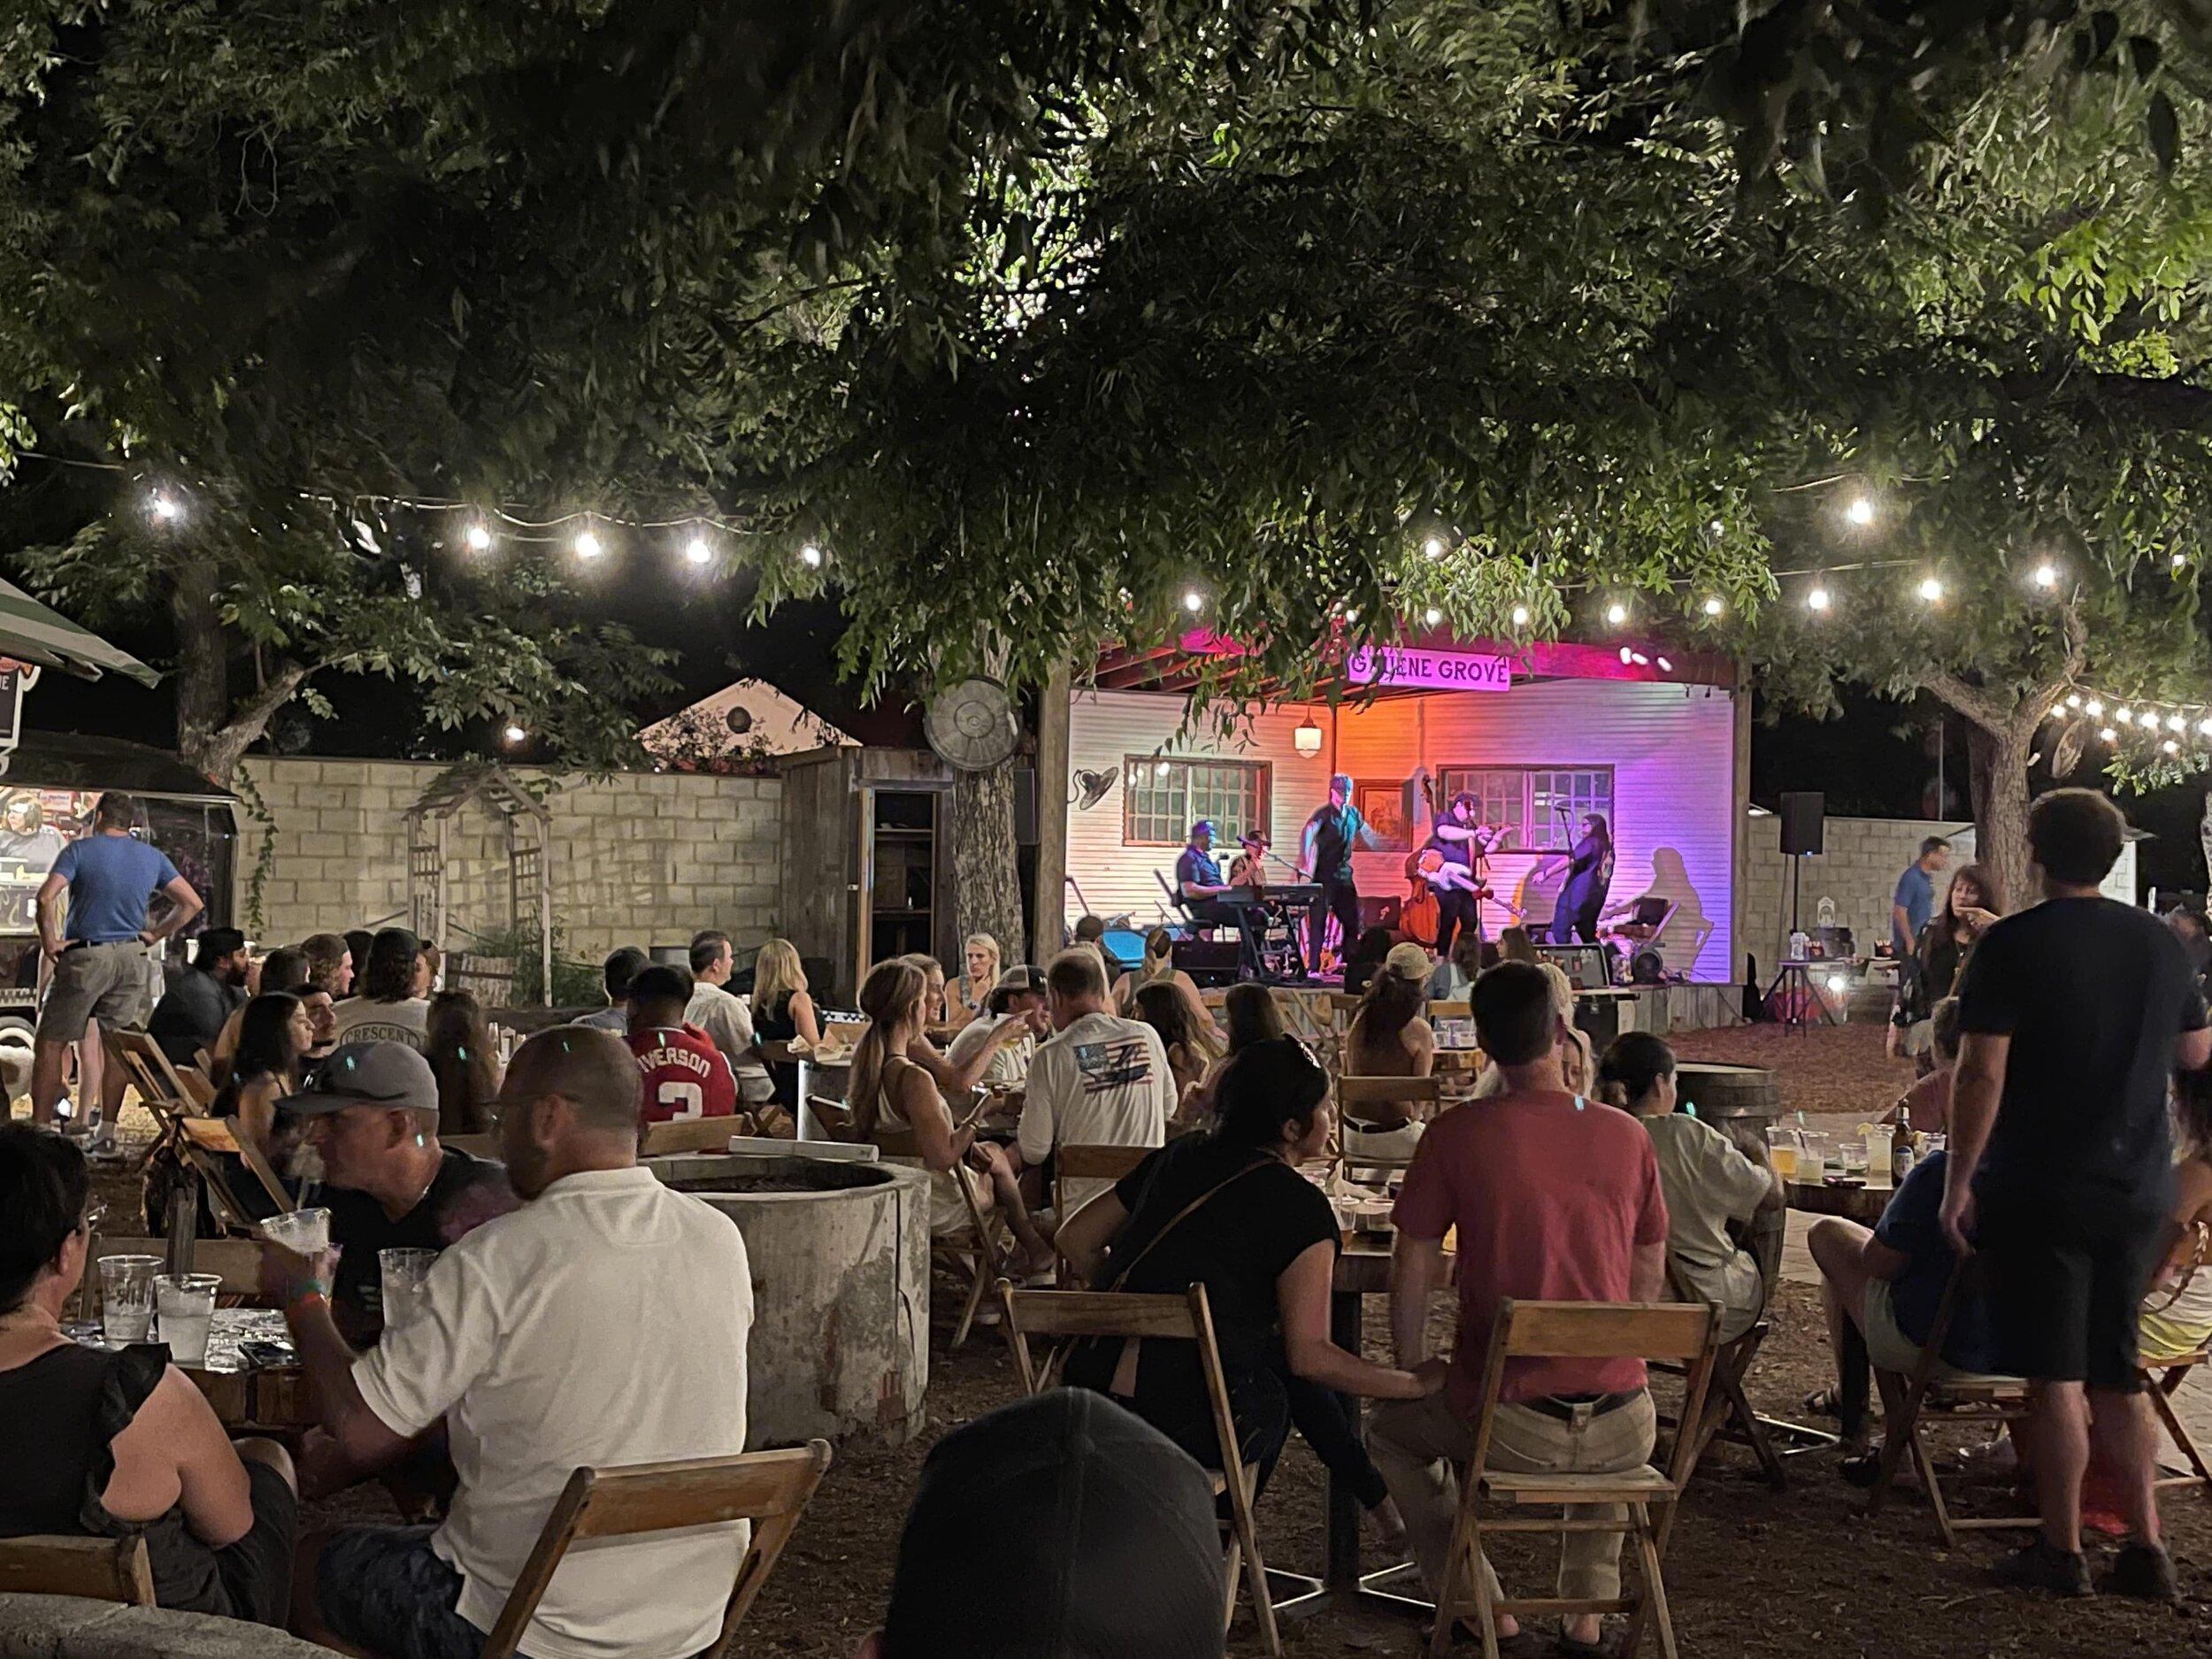 People listening to music at Gruen Grove